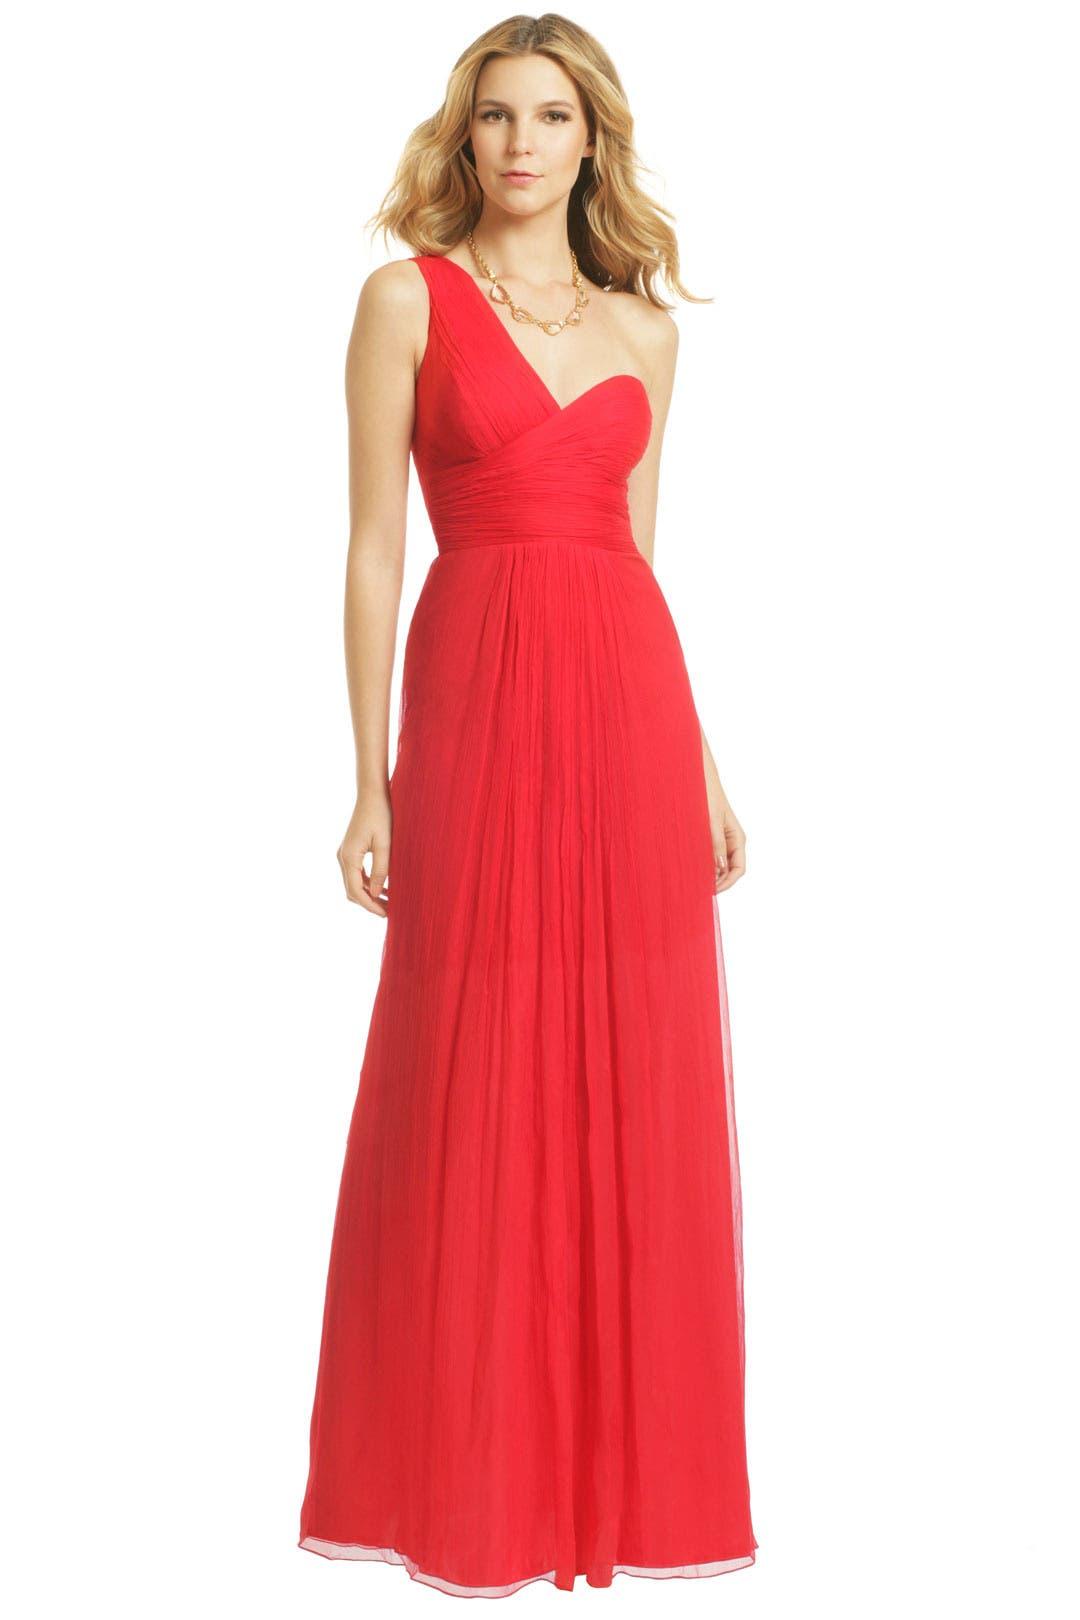 Vermelho Olinda Gown by Carlos Miele